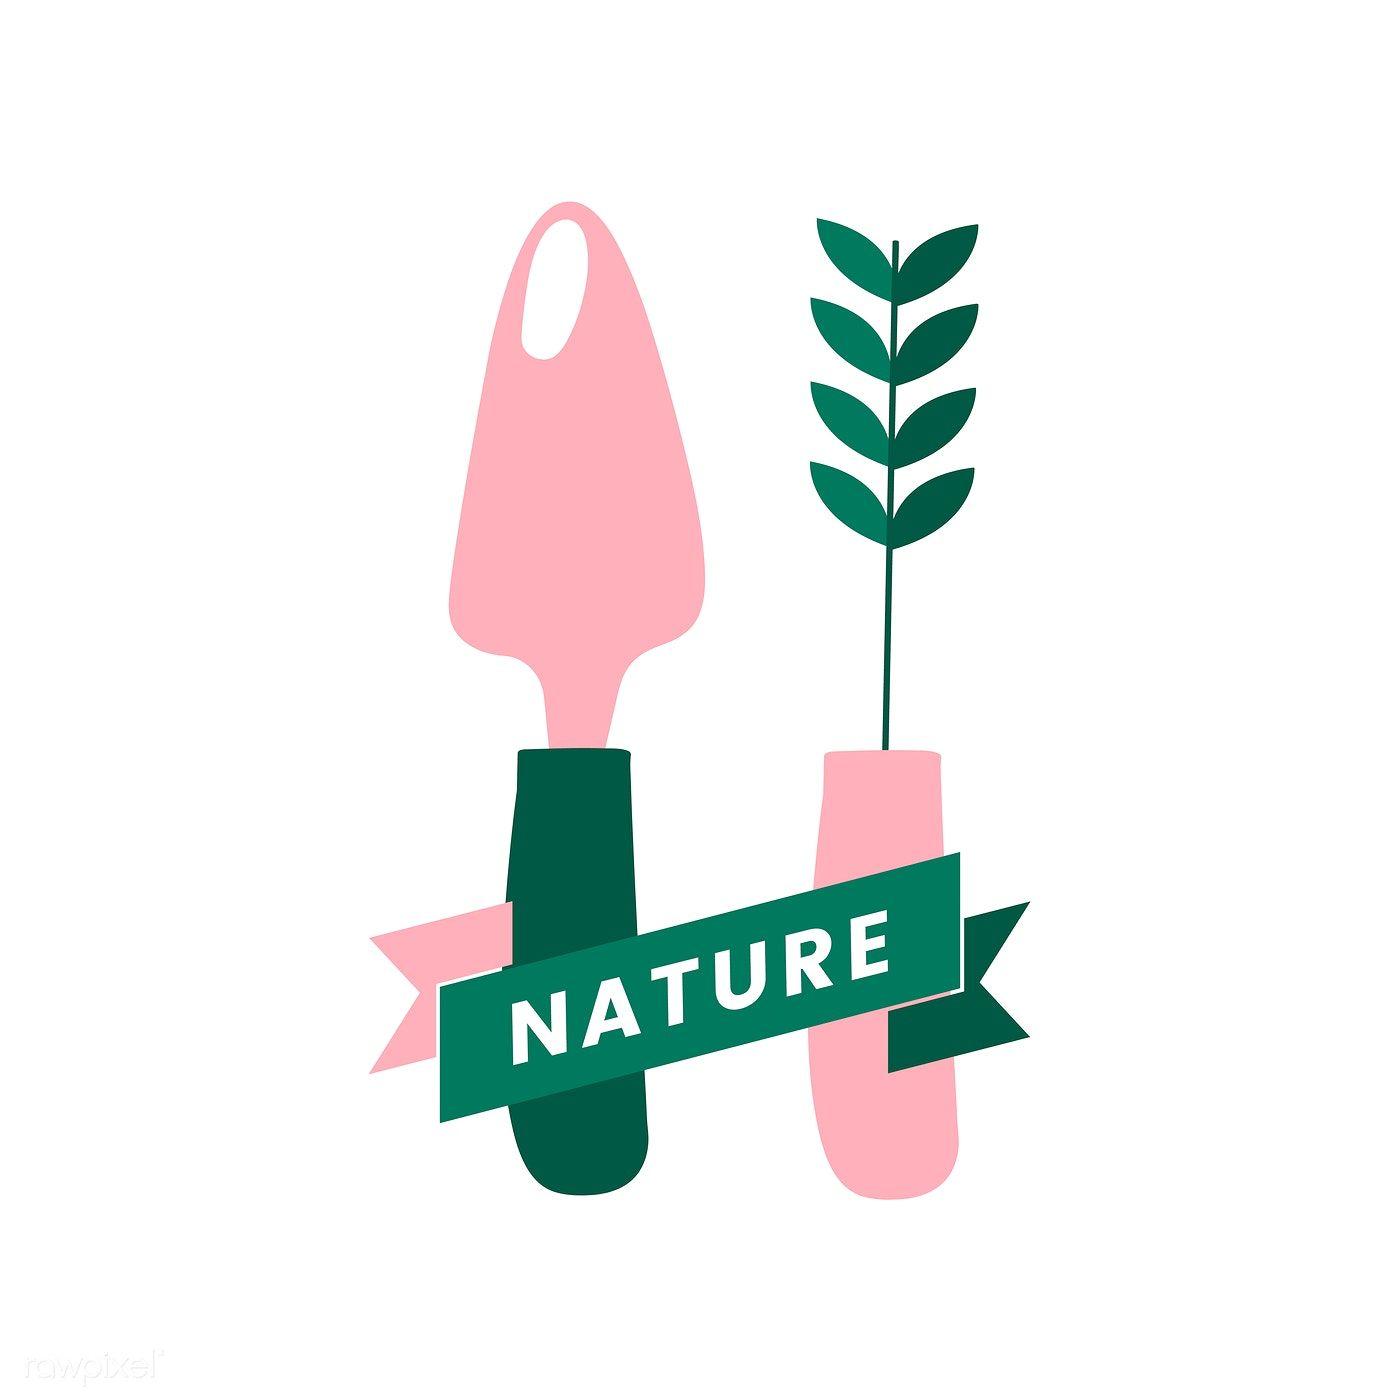 Logo of nature organic farming free image by rawpixel